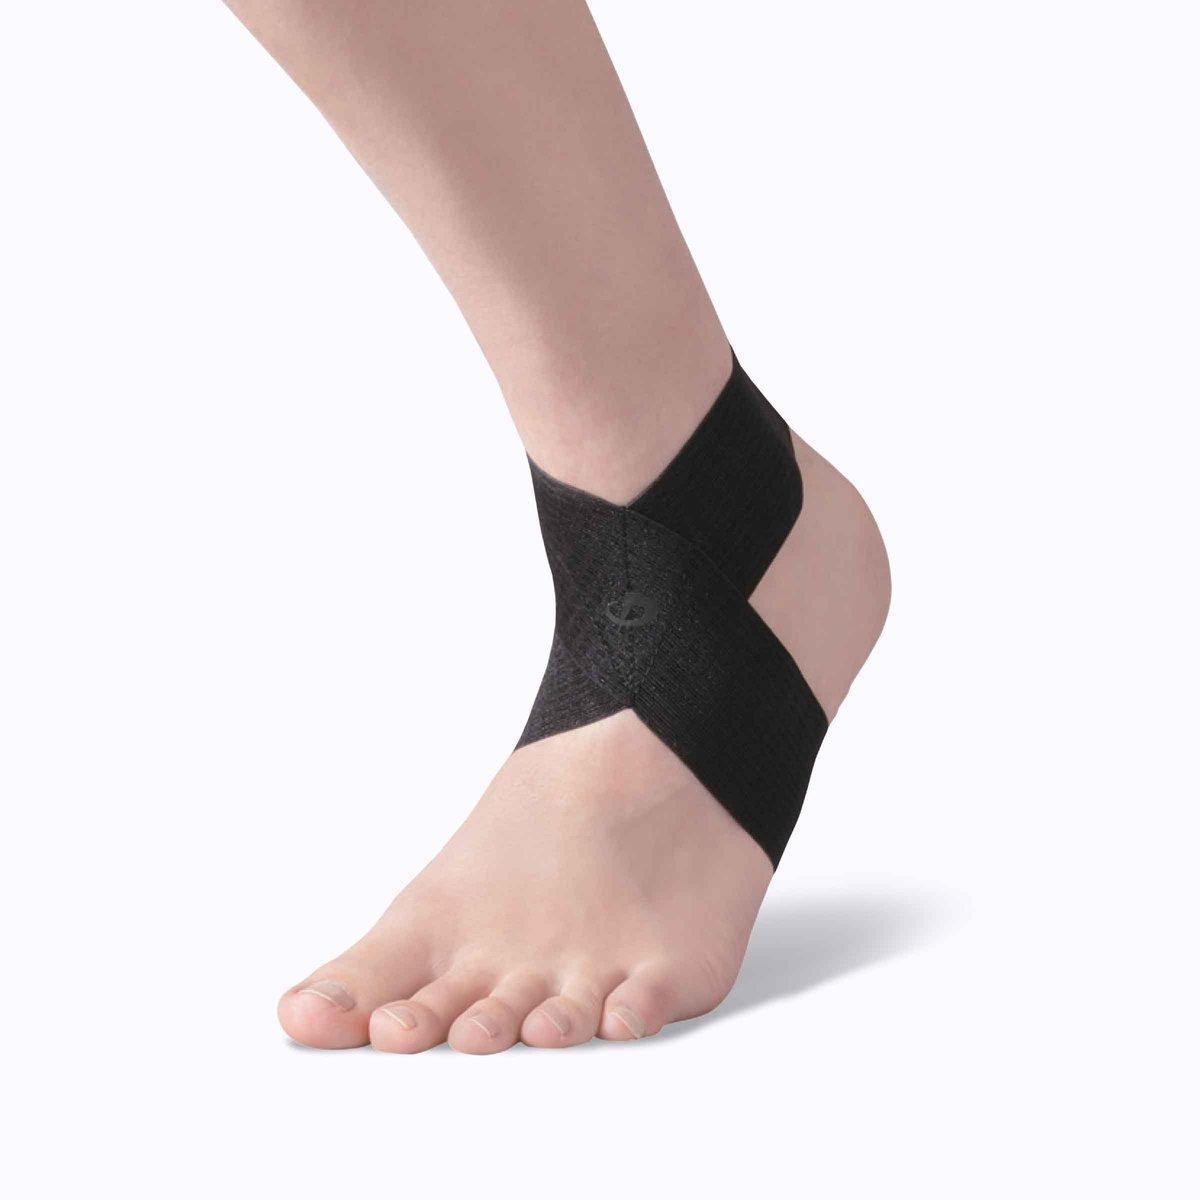 Đai Bảo Vệ Cổ Chân Phiten Supporter Ankle Soft Type ( Loại Mềm )